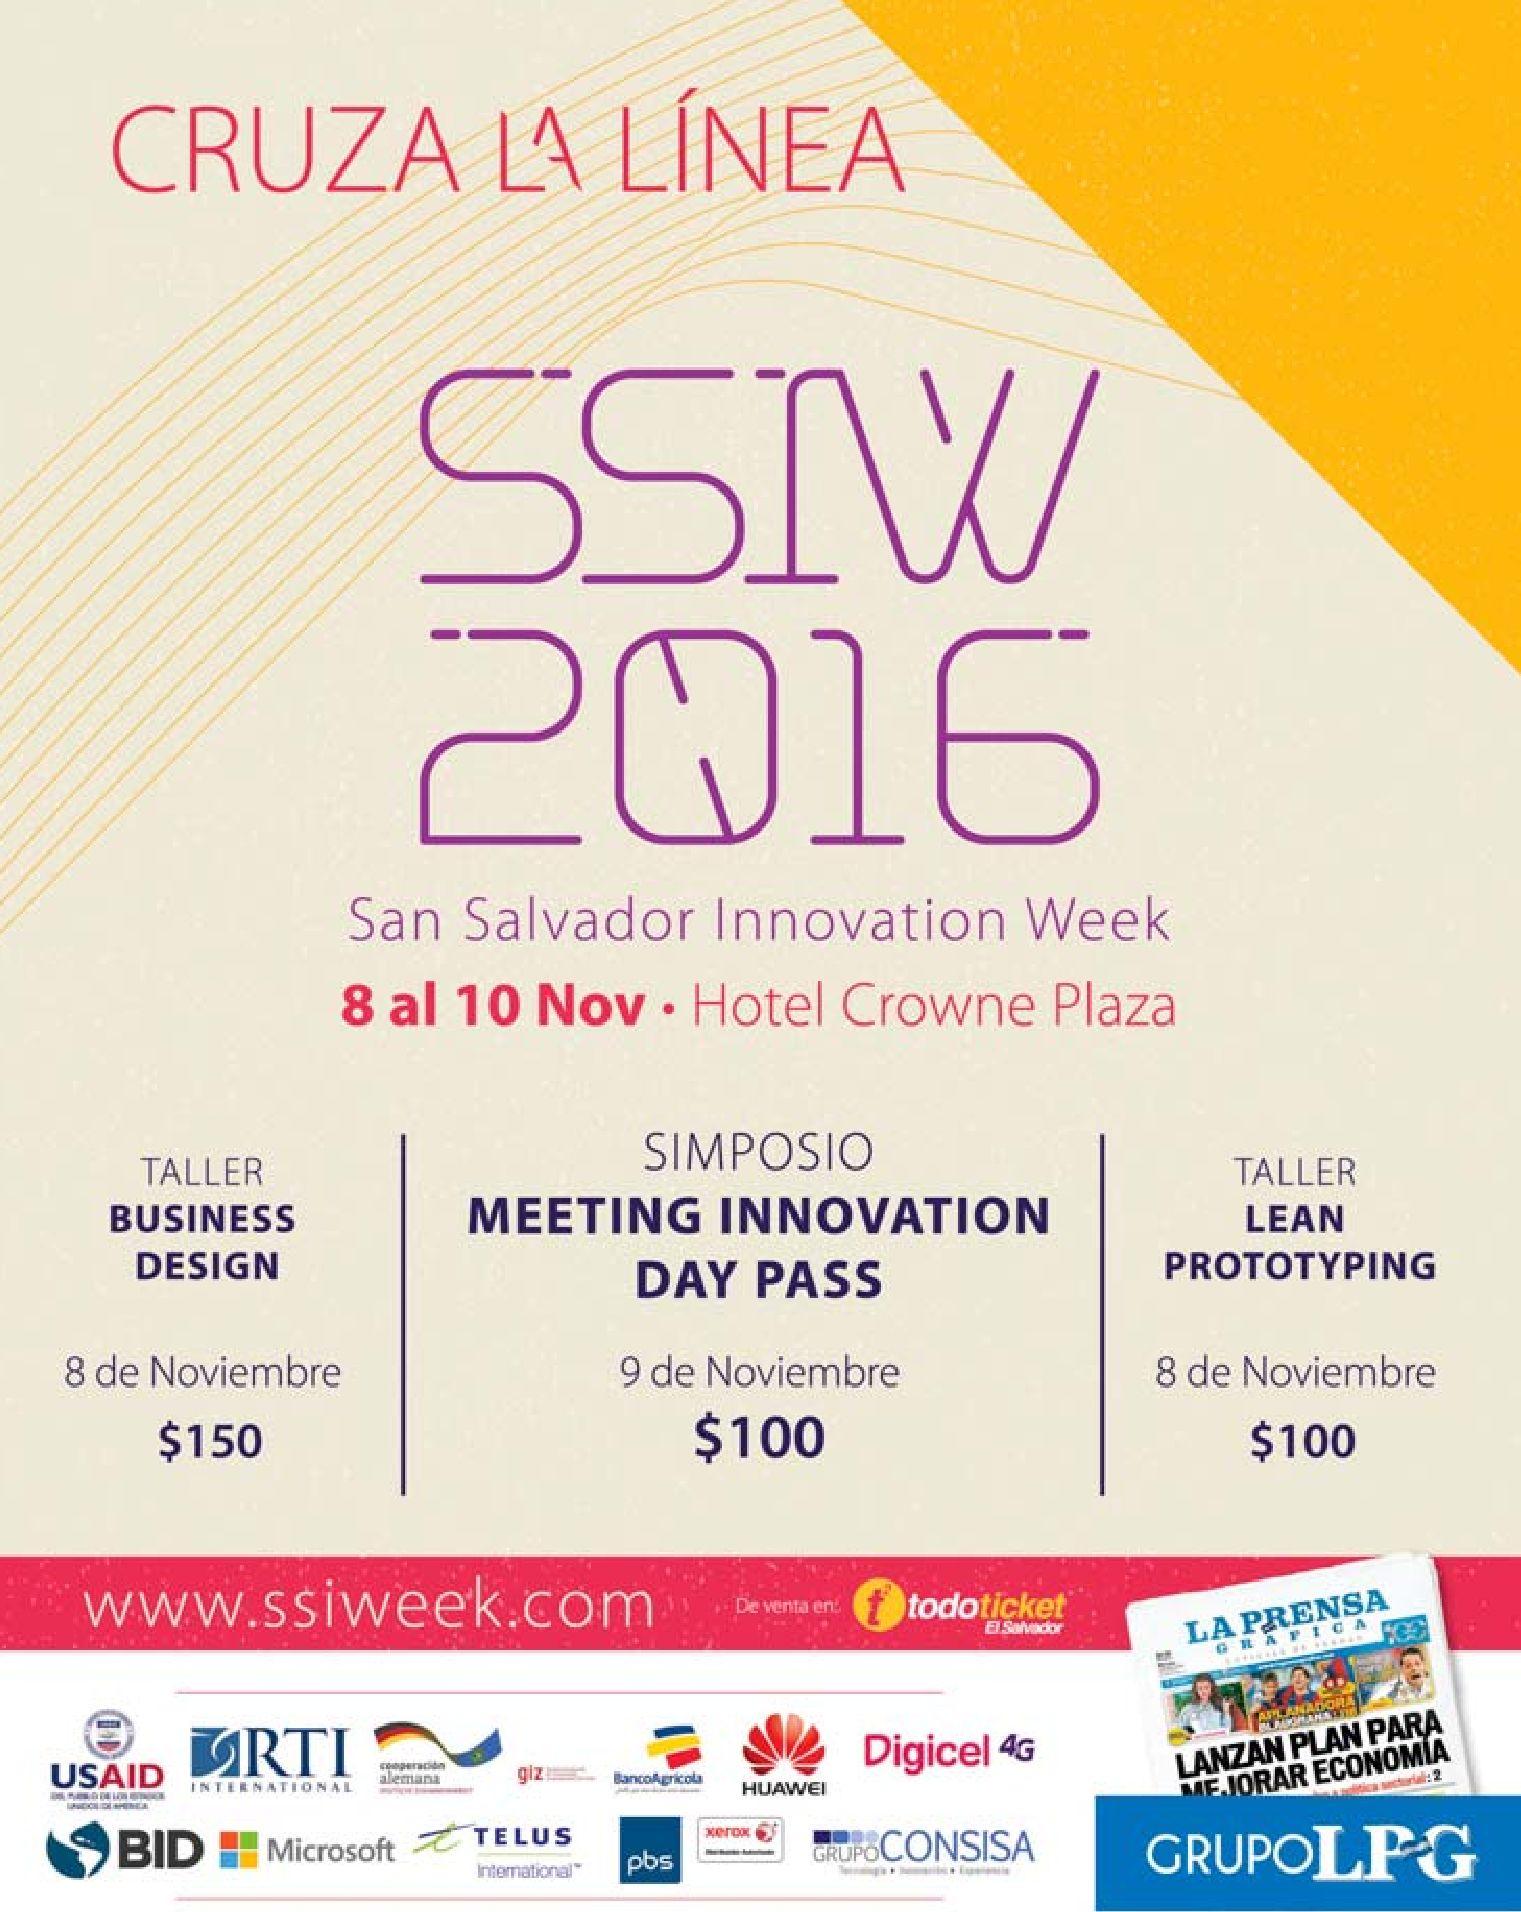 san-salvador-innovation-week-2016-ssiw